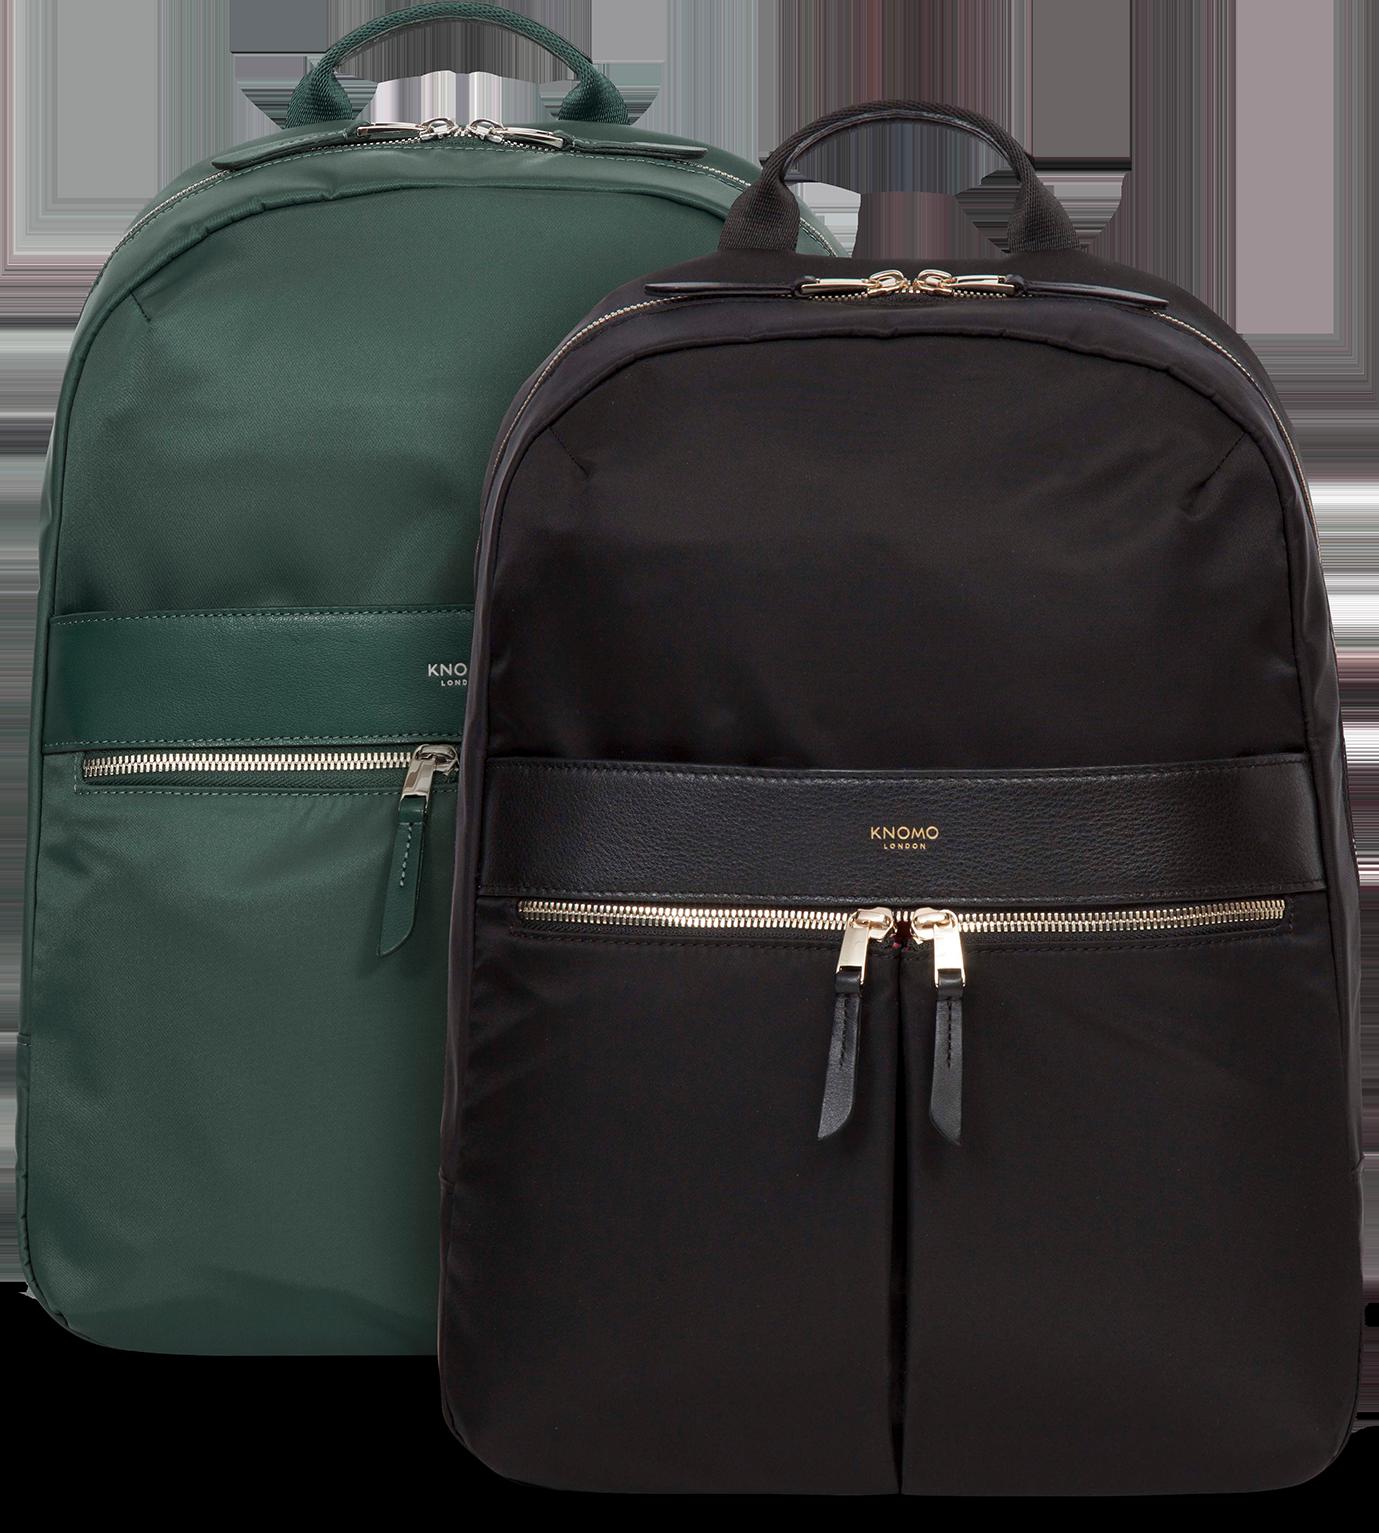 b1adcaa99f60 Buy Knomo Beauchamp 14-Inch Backpack - Microsoft Store en-GB